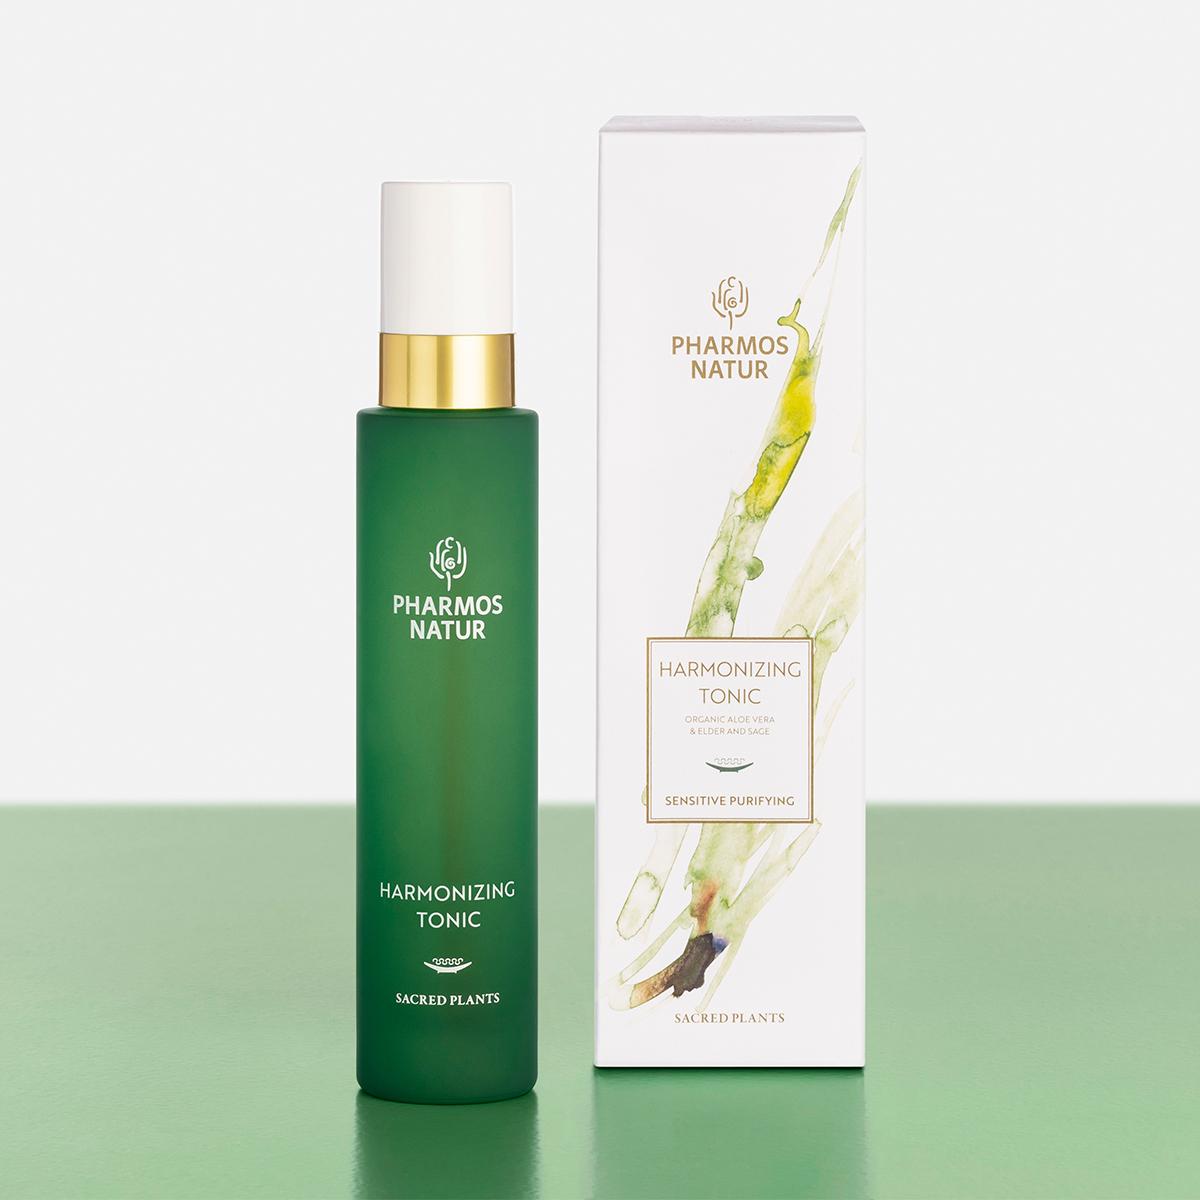 Grünes Harmonizing Tonic Produktbild